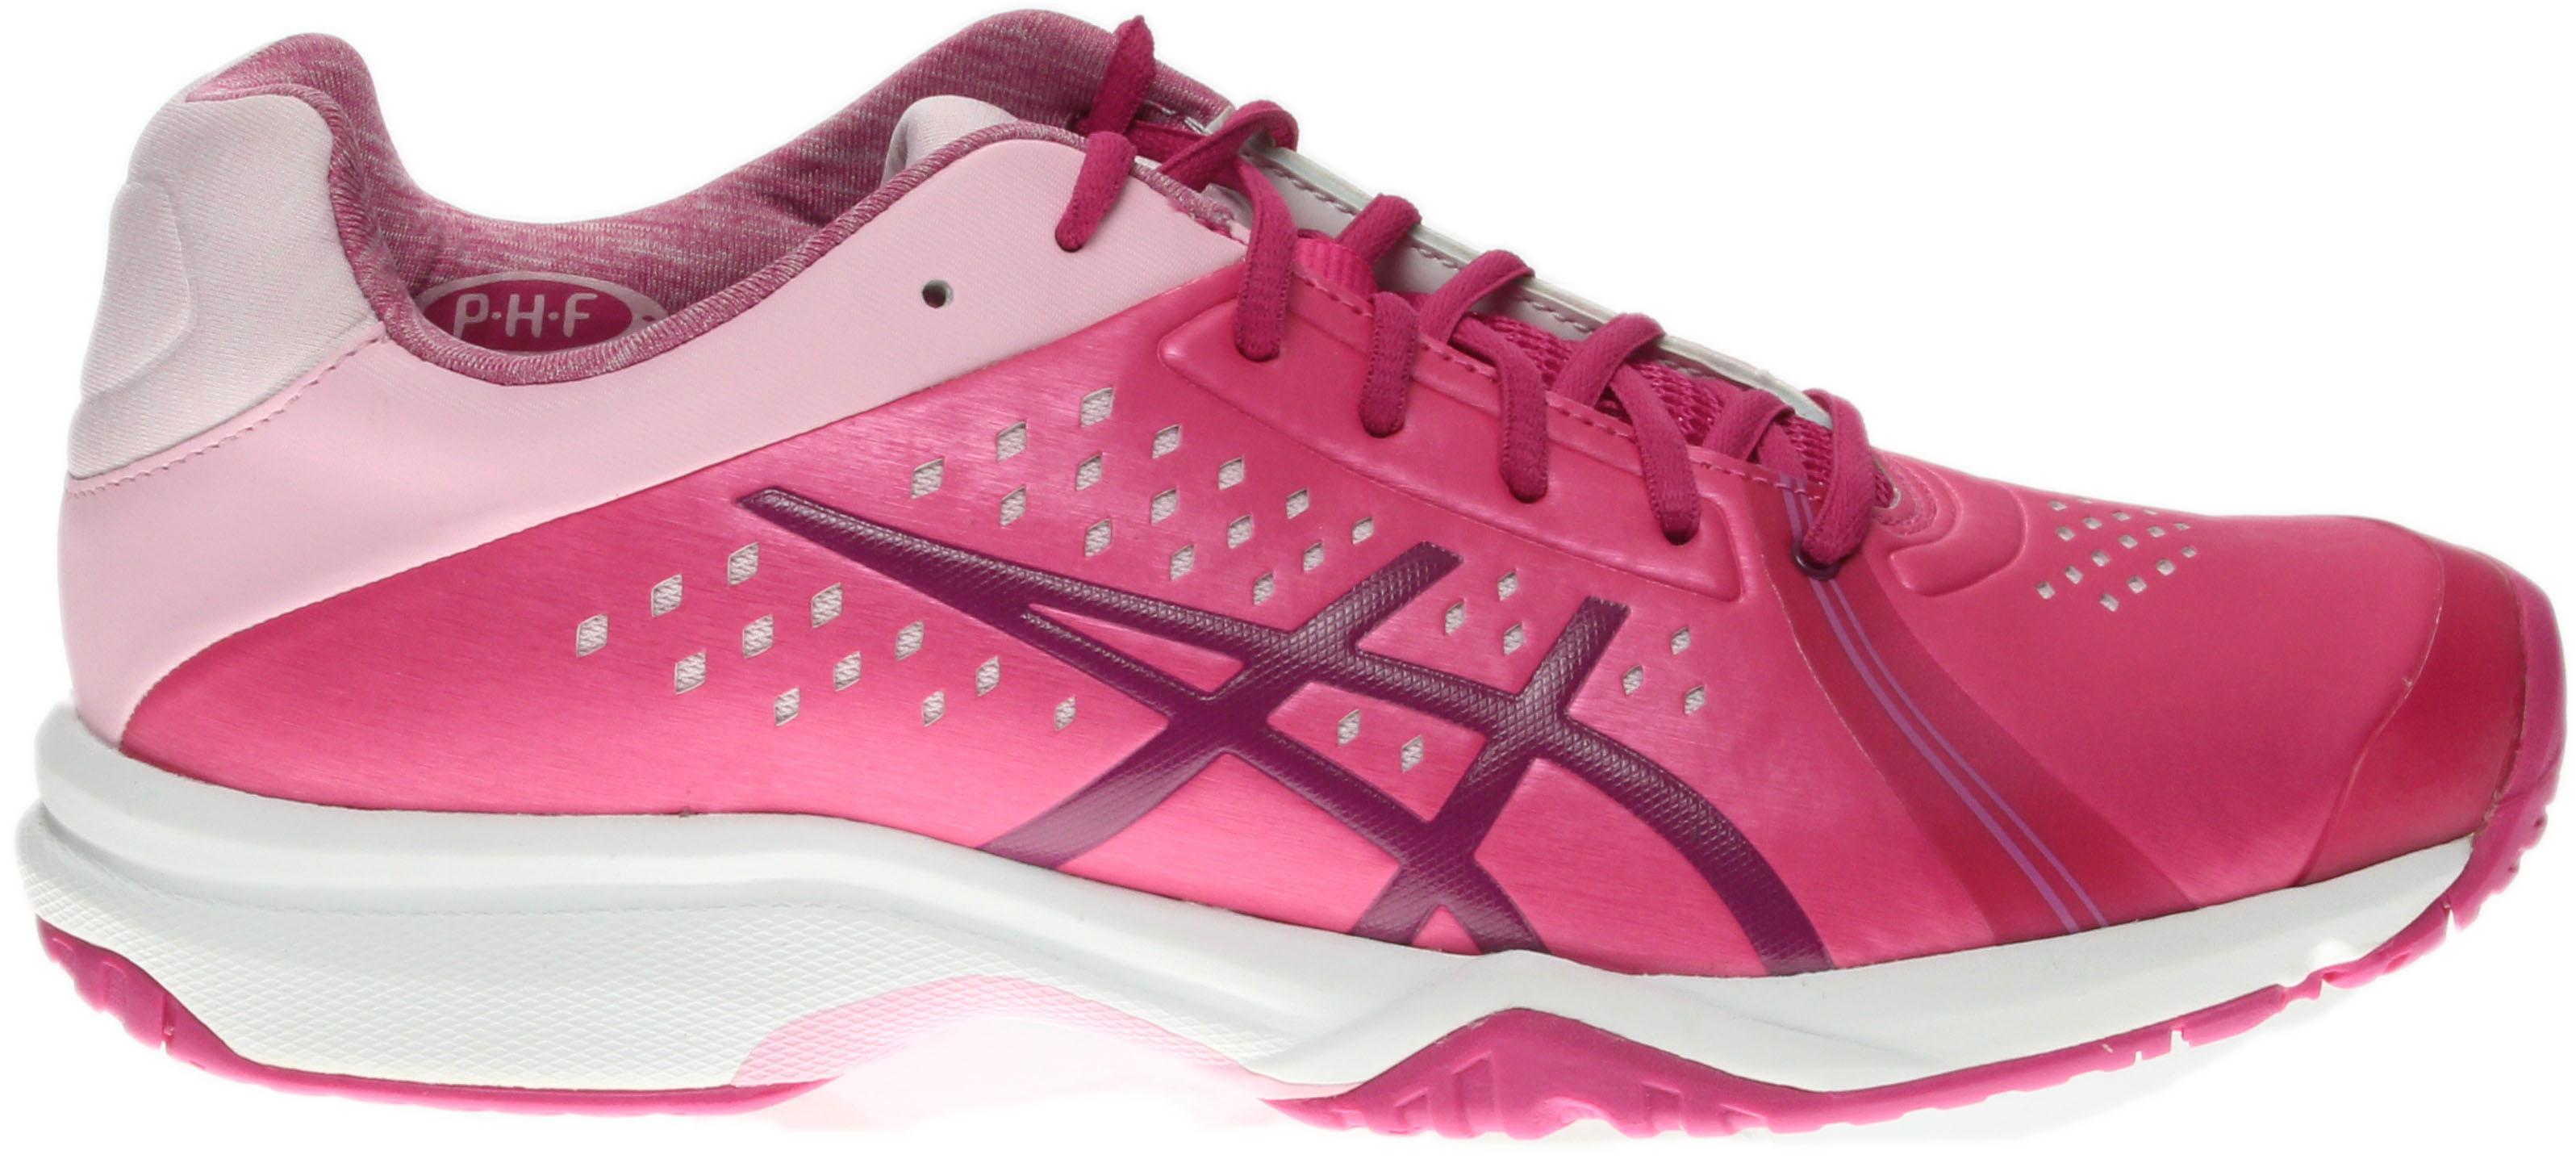 fee54f69898d Asics - Pink Gel-court Bella - Lyst. View fullscreen